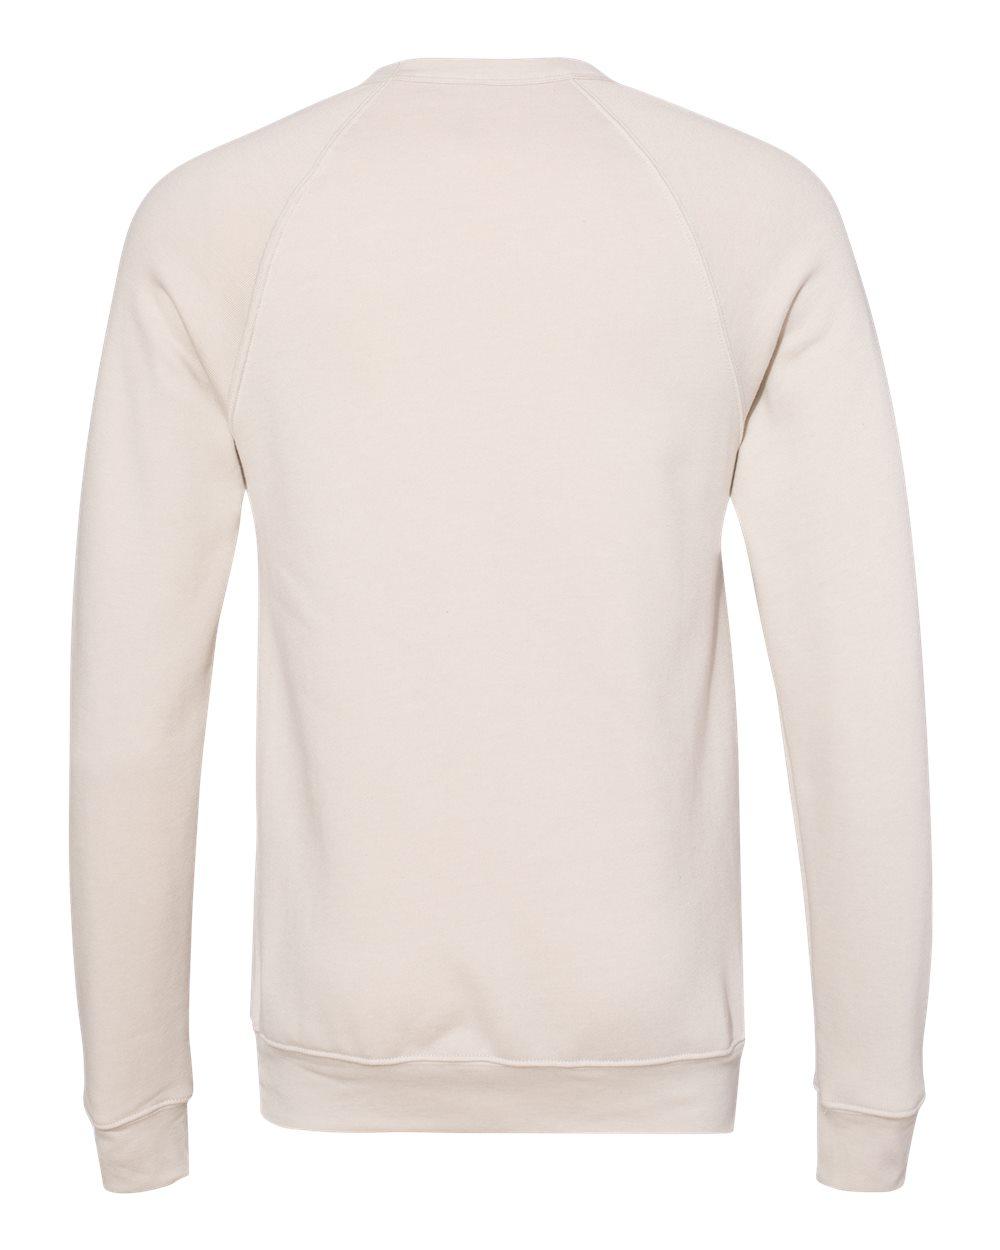 Bella-Canvas-Unisex-Sponge-Fleece-Crewneck-Sweatshirt-Top-Blank-3901-up-to-2XL thumbnail 33